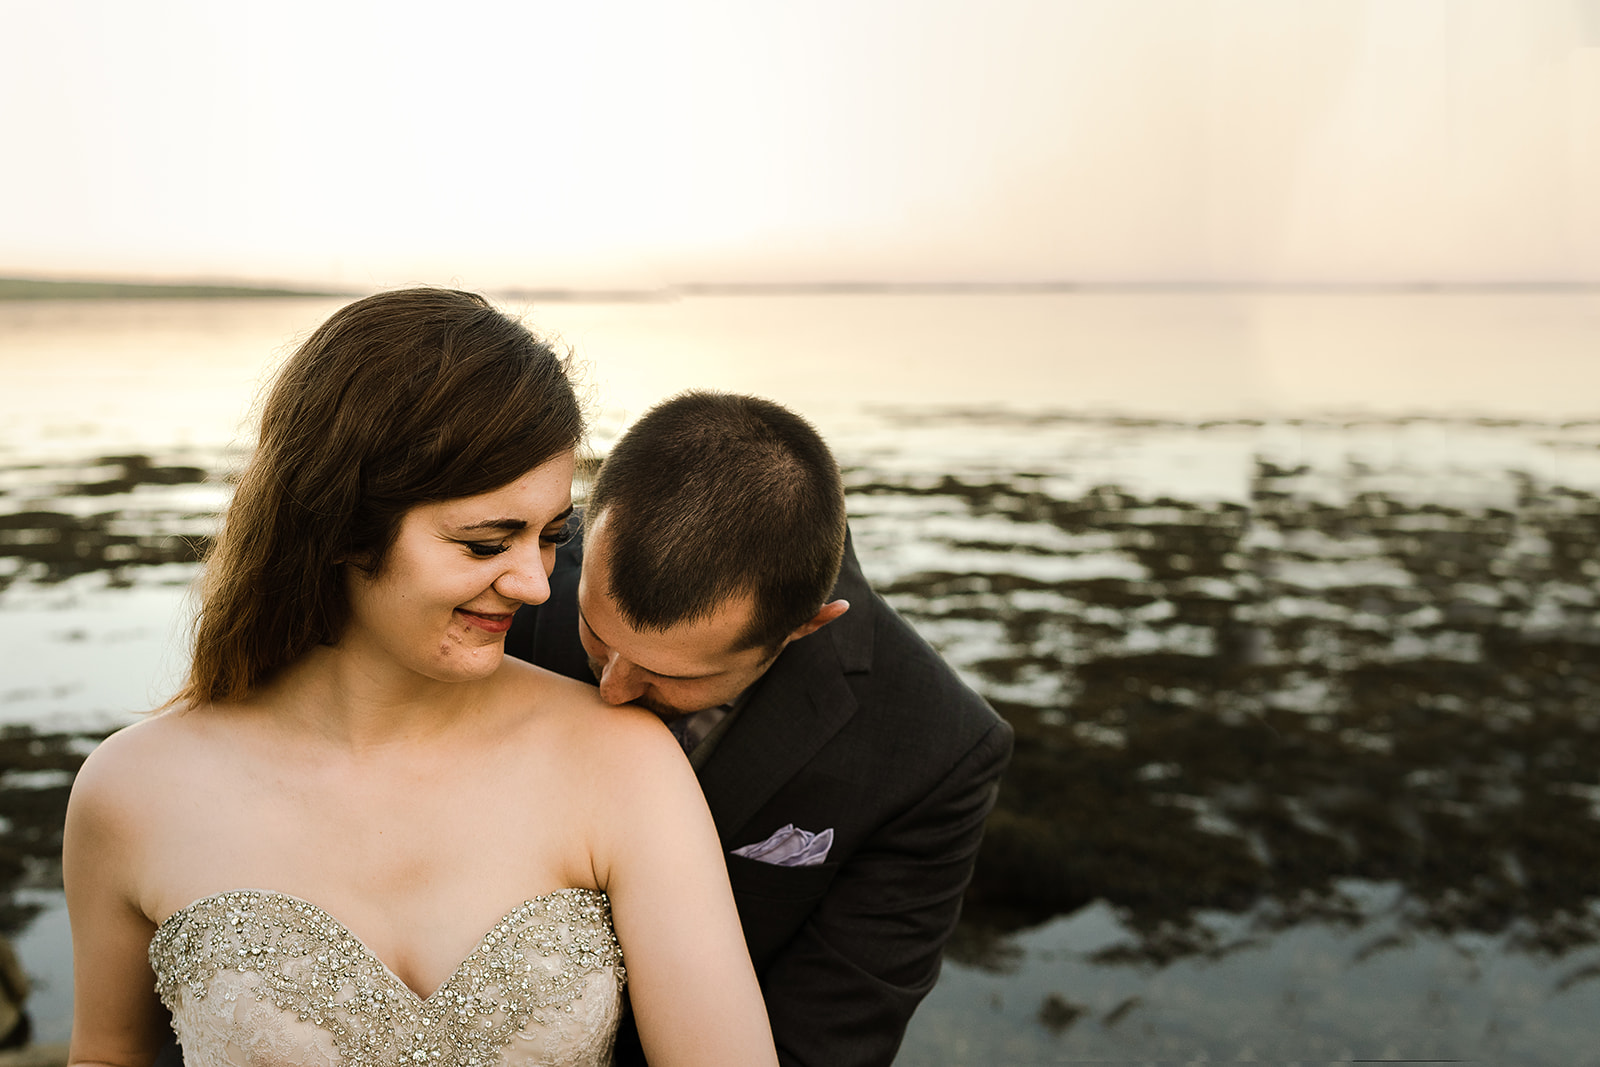 Bangor Maine Wedding and Coastal Maine Portrait Session 11